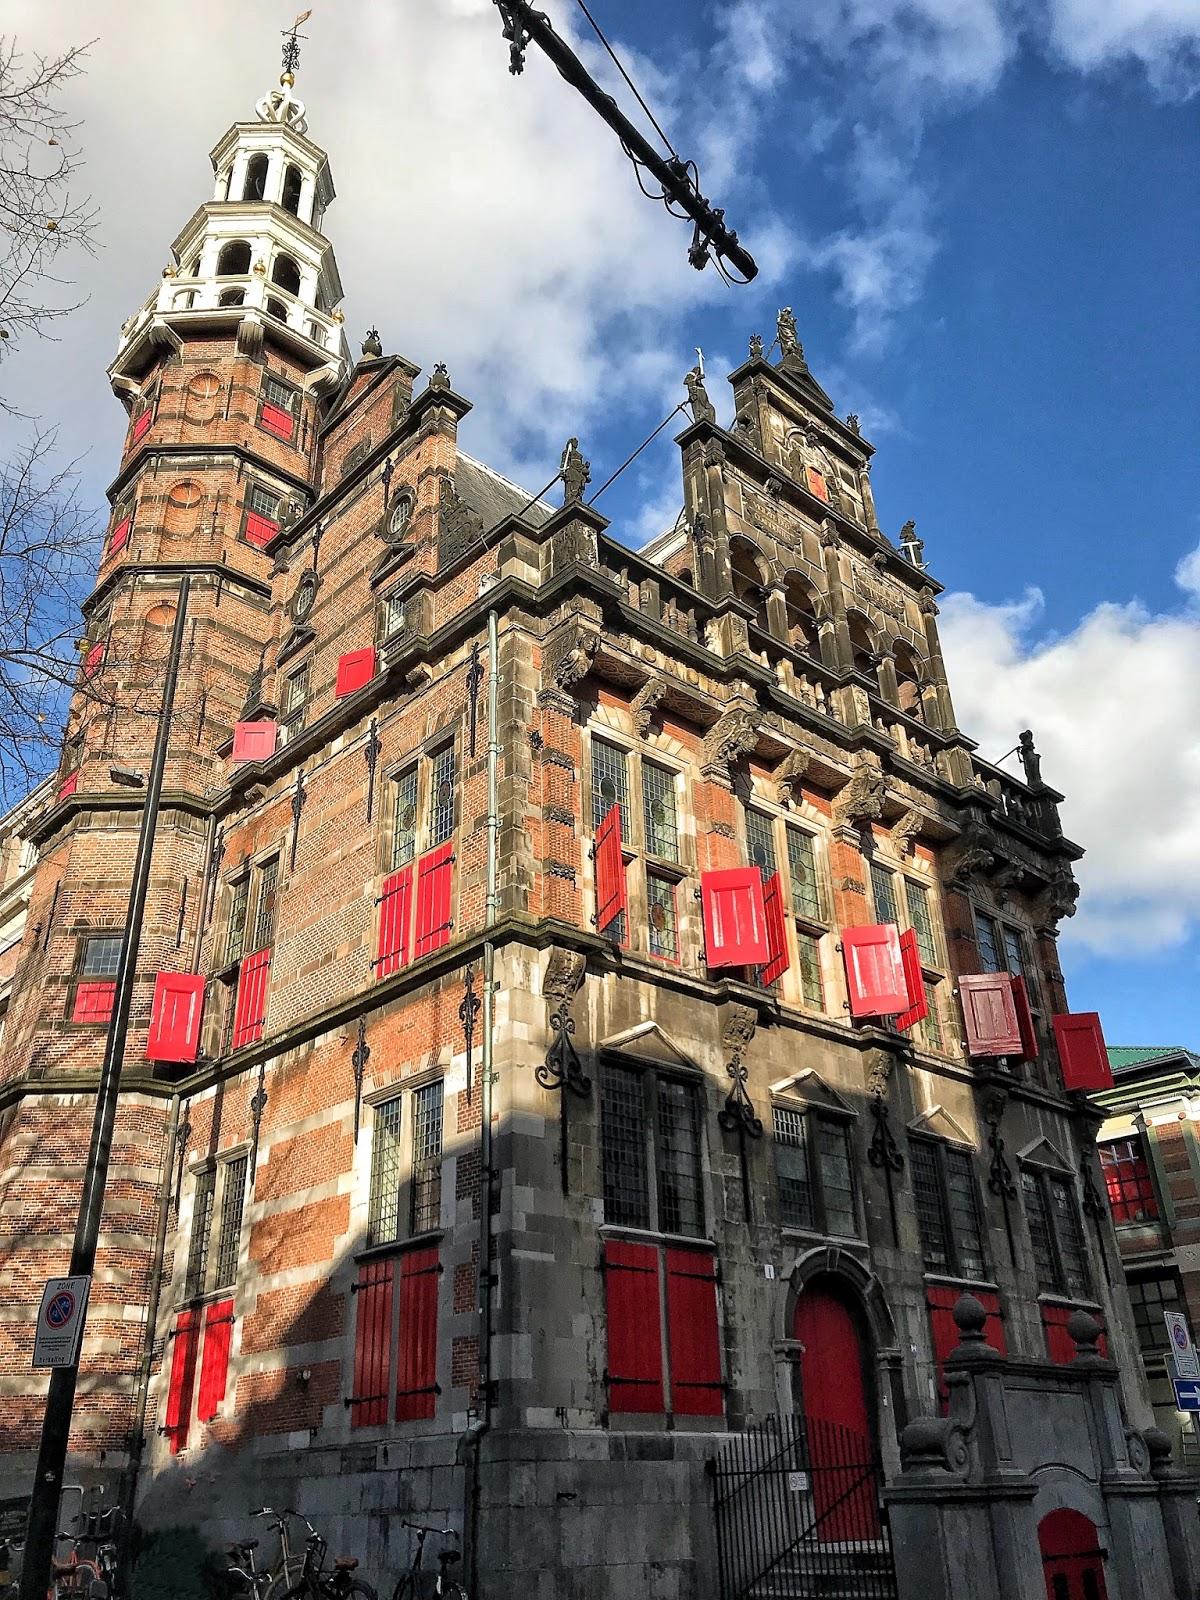 The Hague City Hall Netherlands